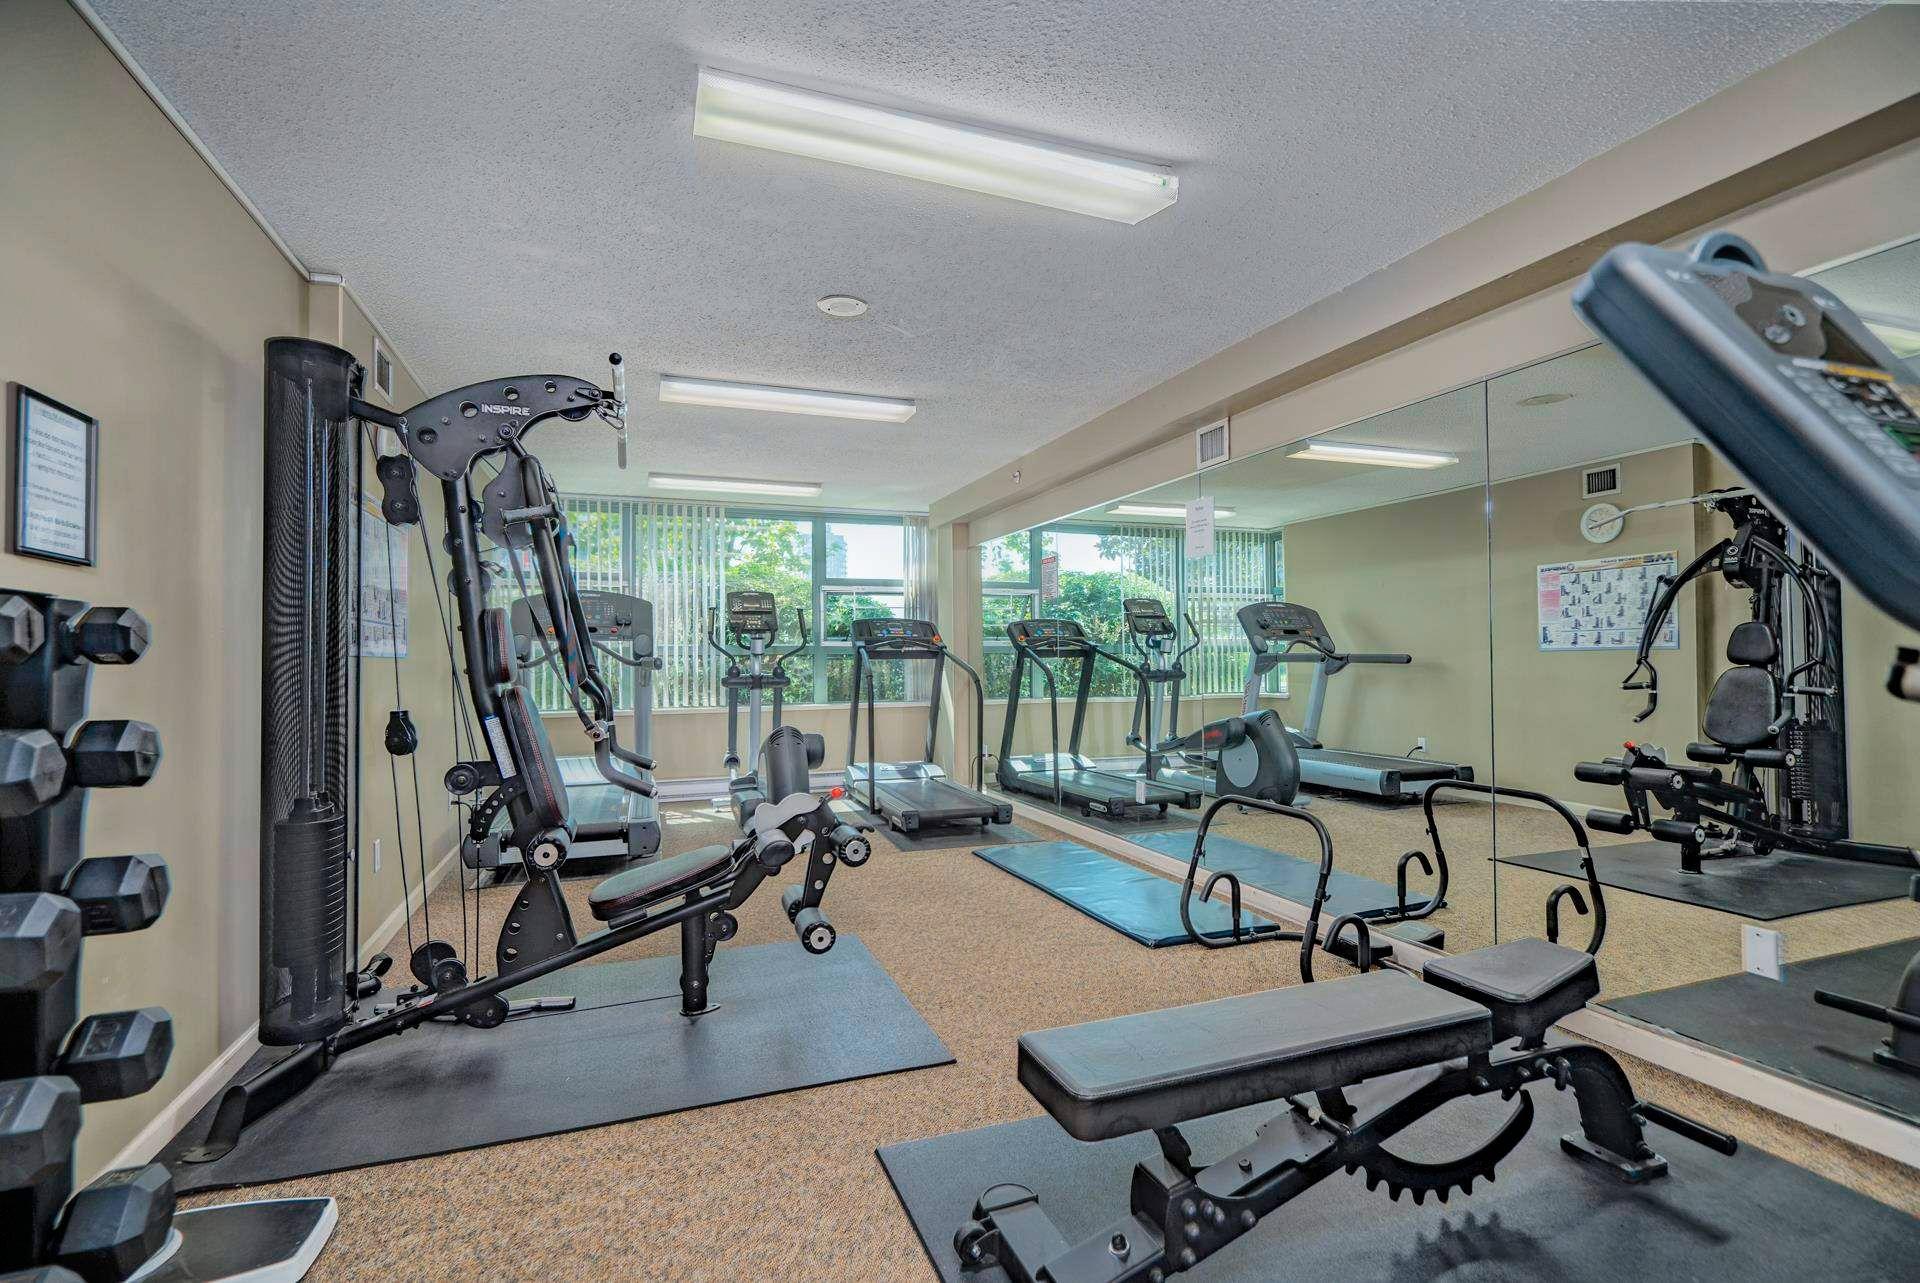 "Photo 32: Photos: 704 4388 BUCHANAN Street in Burnaby: Brentwood Park Condo for sale in ""Buchanan West"" (Burnaby North)  : MLS®# R2607208"